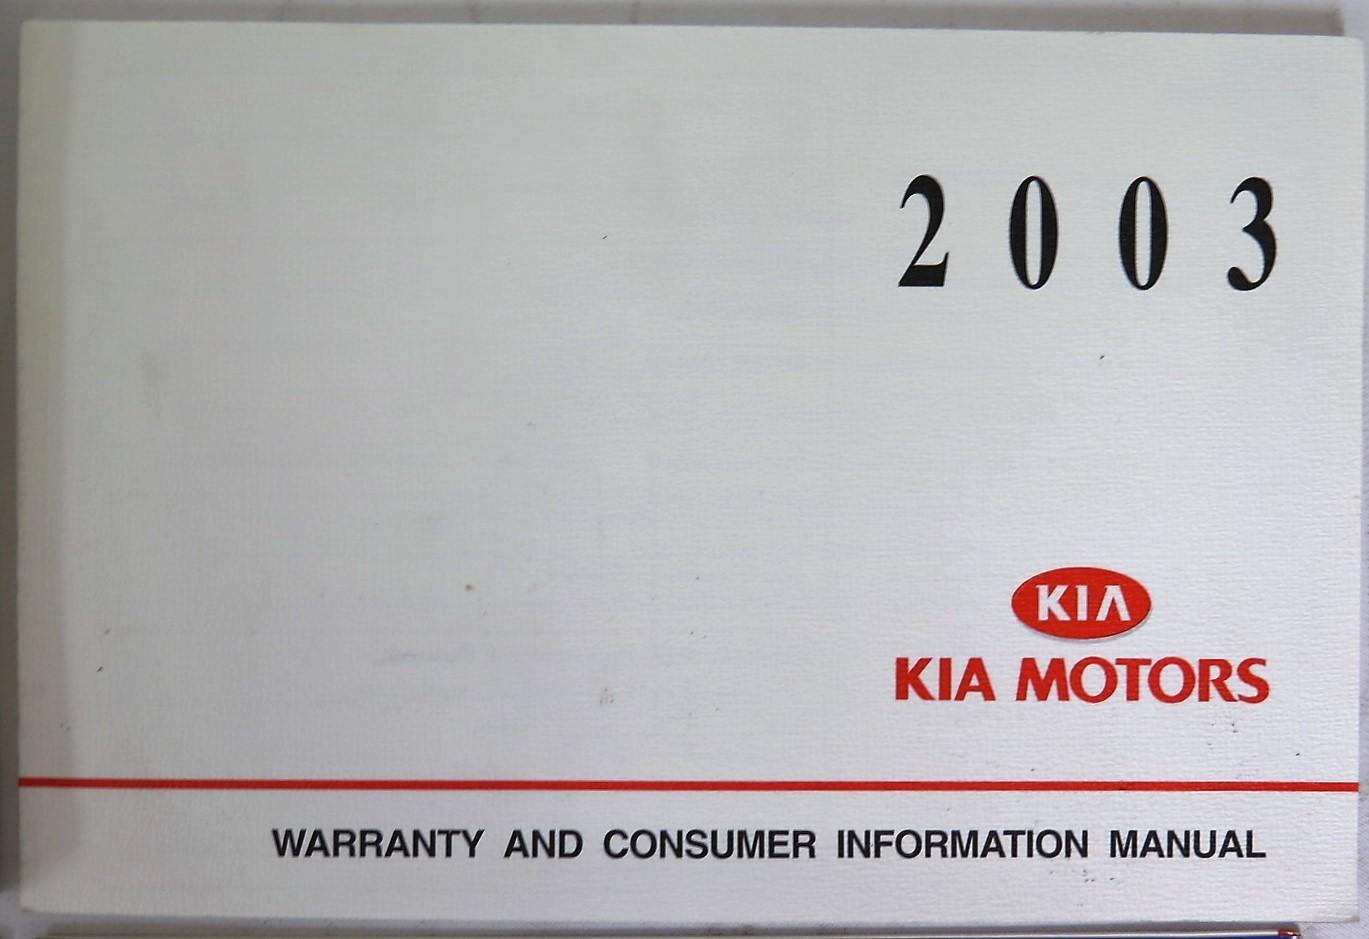 2003 kia spectra owners manual book bashful yak rh bashfulyak com kia spectra 2003 user manual 2003 Kia Spectra Problem